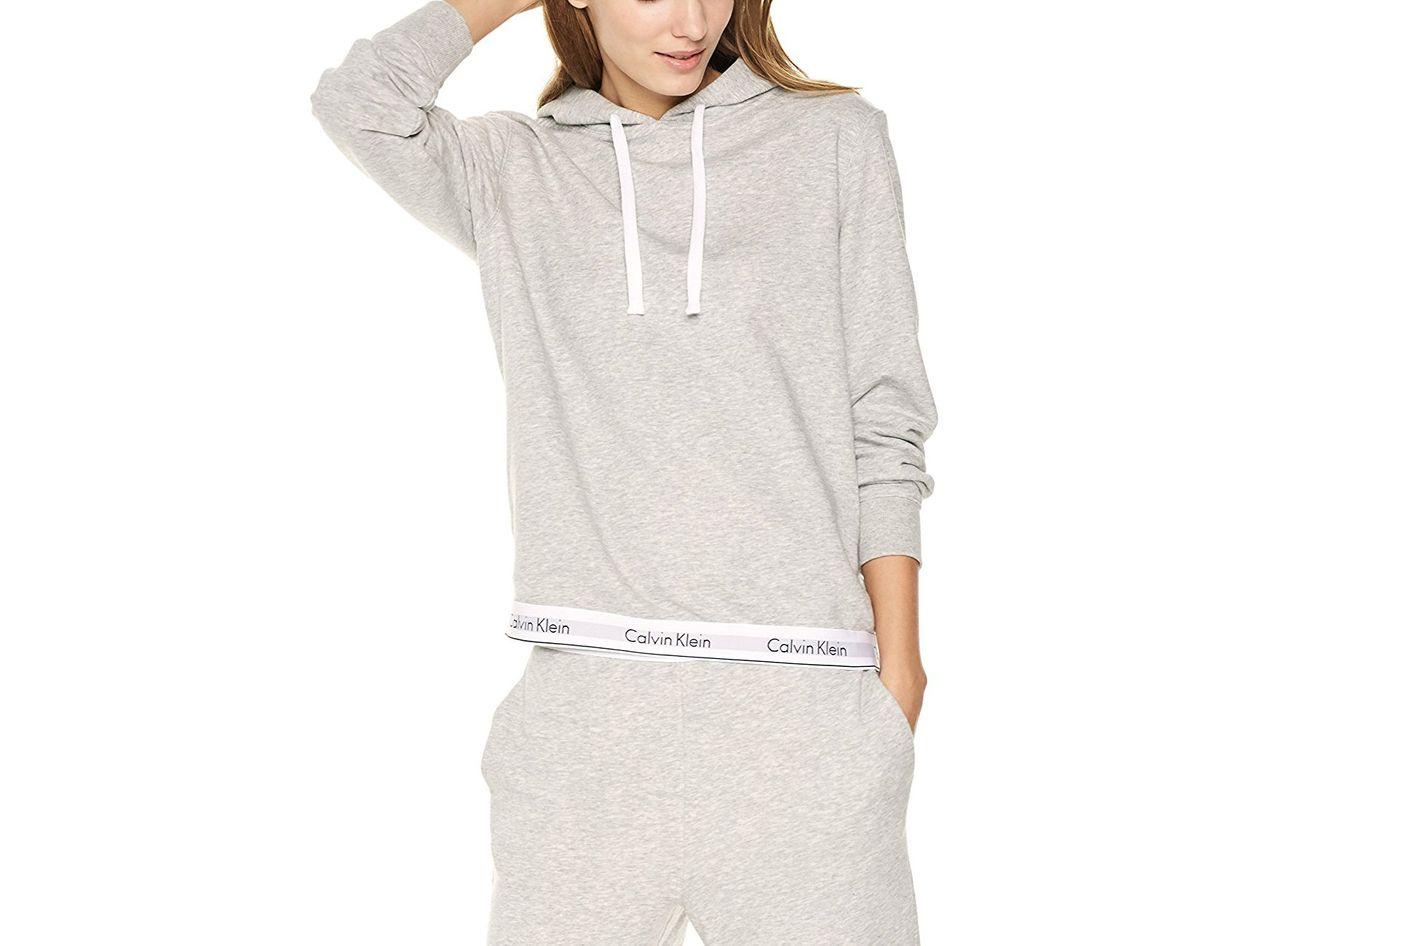 Calvin Klein Women's Modern Cotton Lounge Drawstring Hoodie